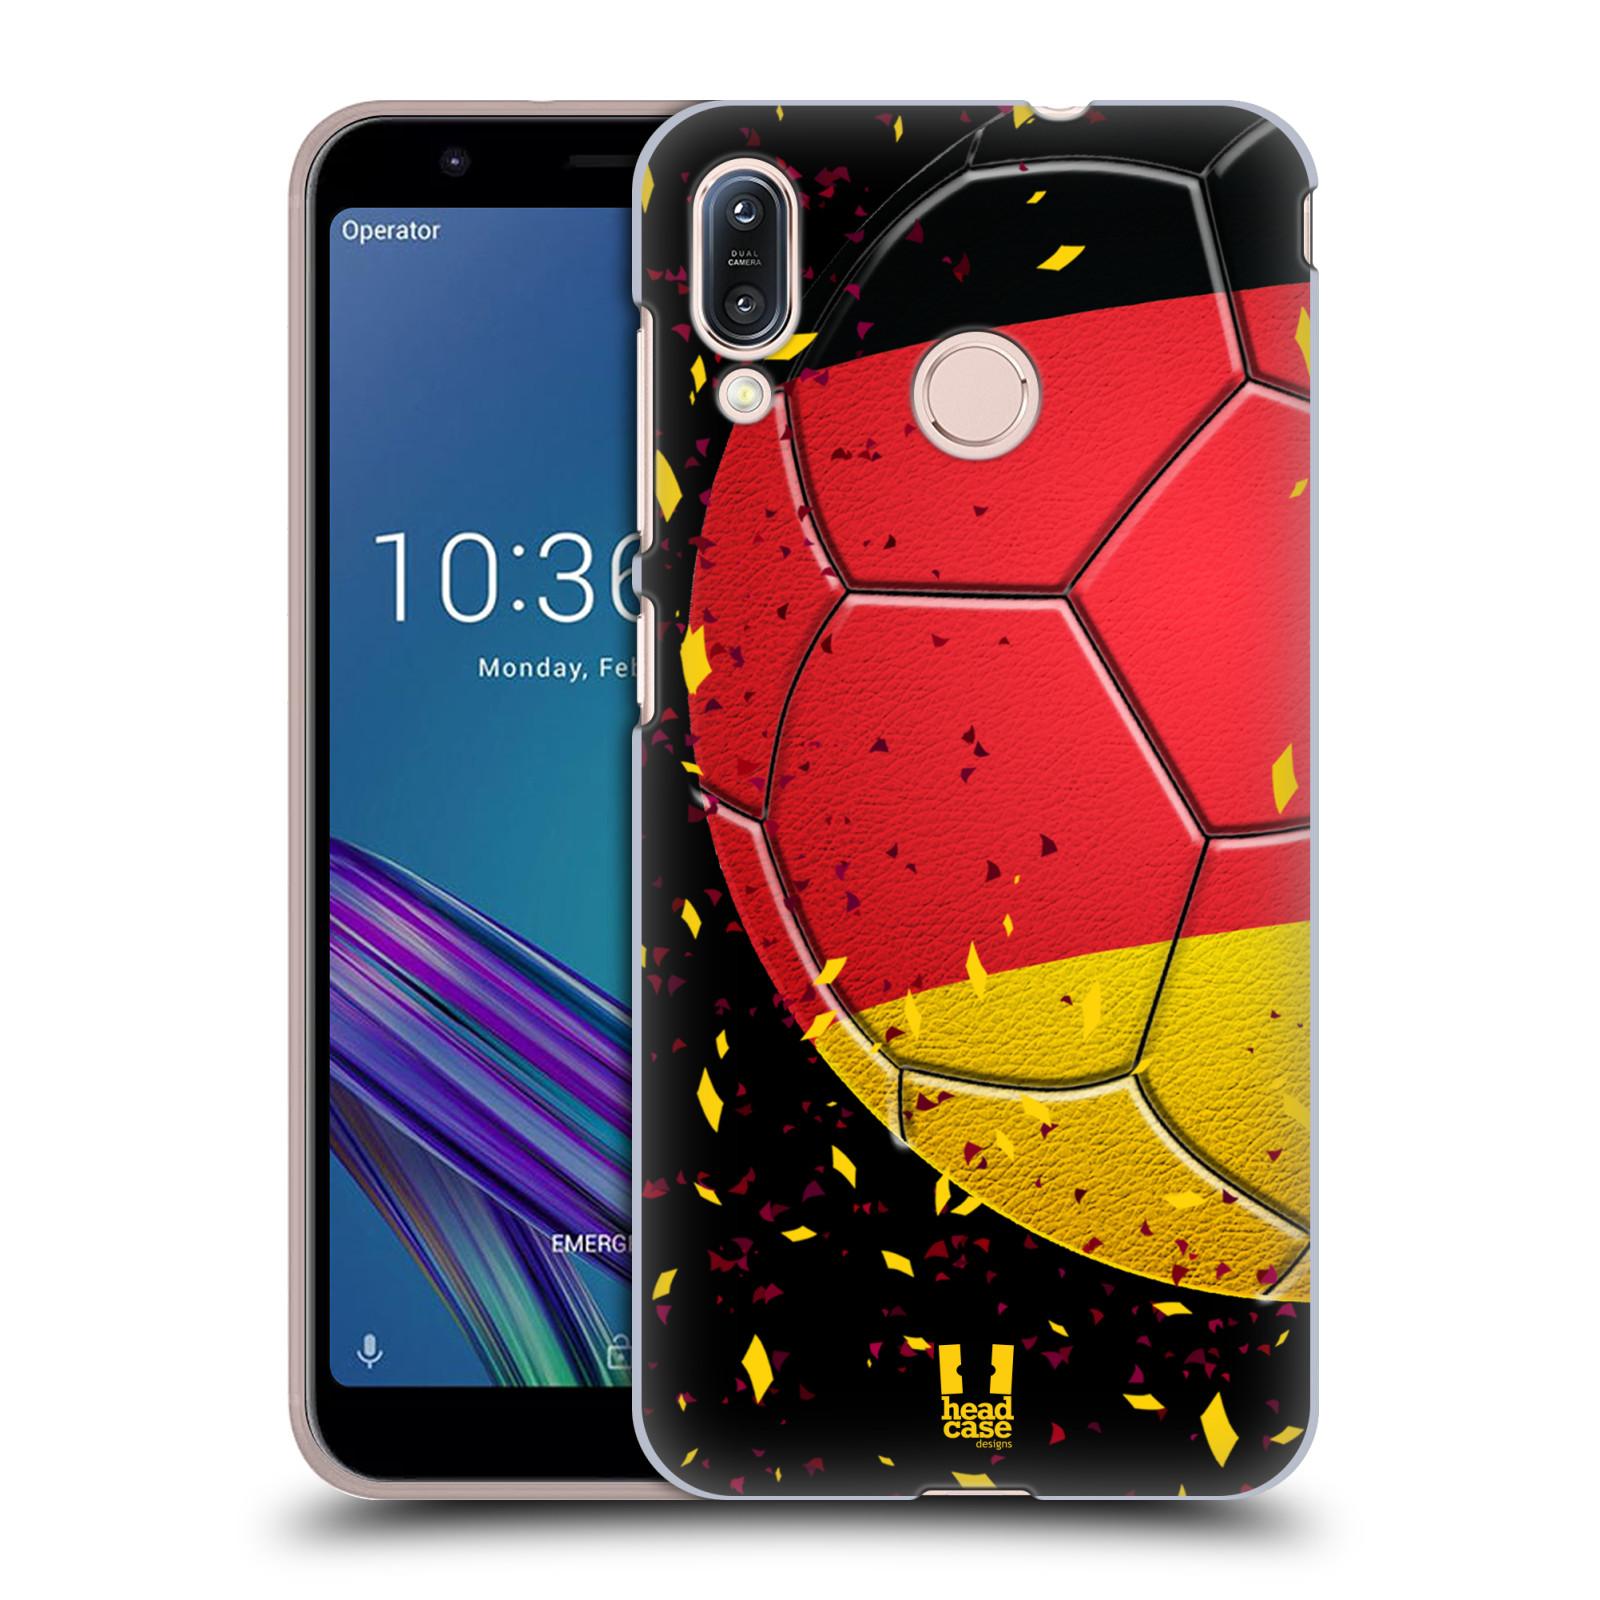 Pouzdro na mobil Asus Zenfone Max M1 (ZB555KL) - HEAD CASE - Sport fotbal mistrovský míč